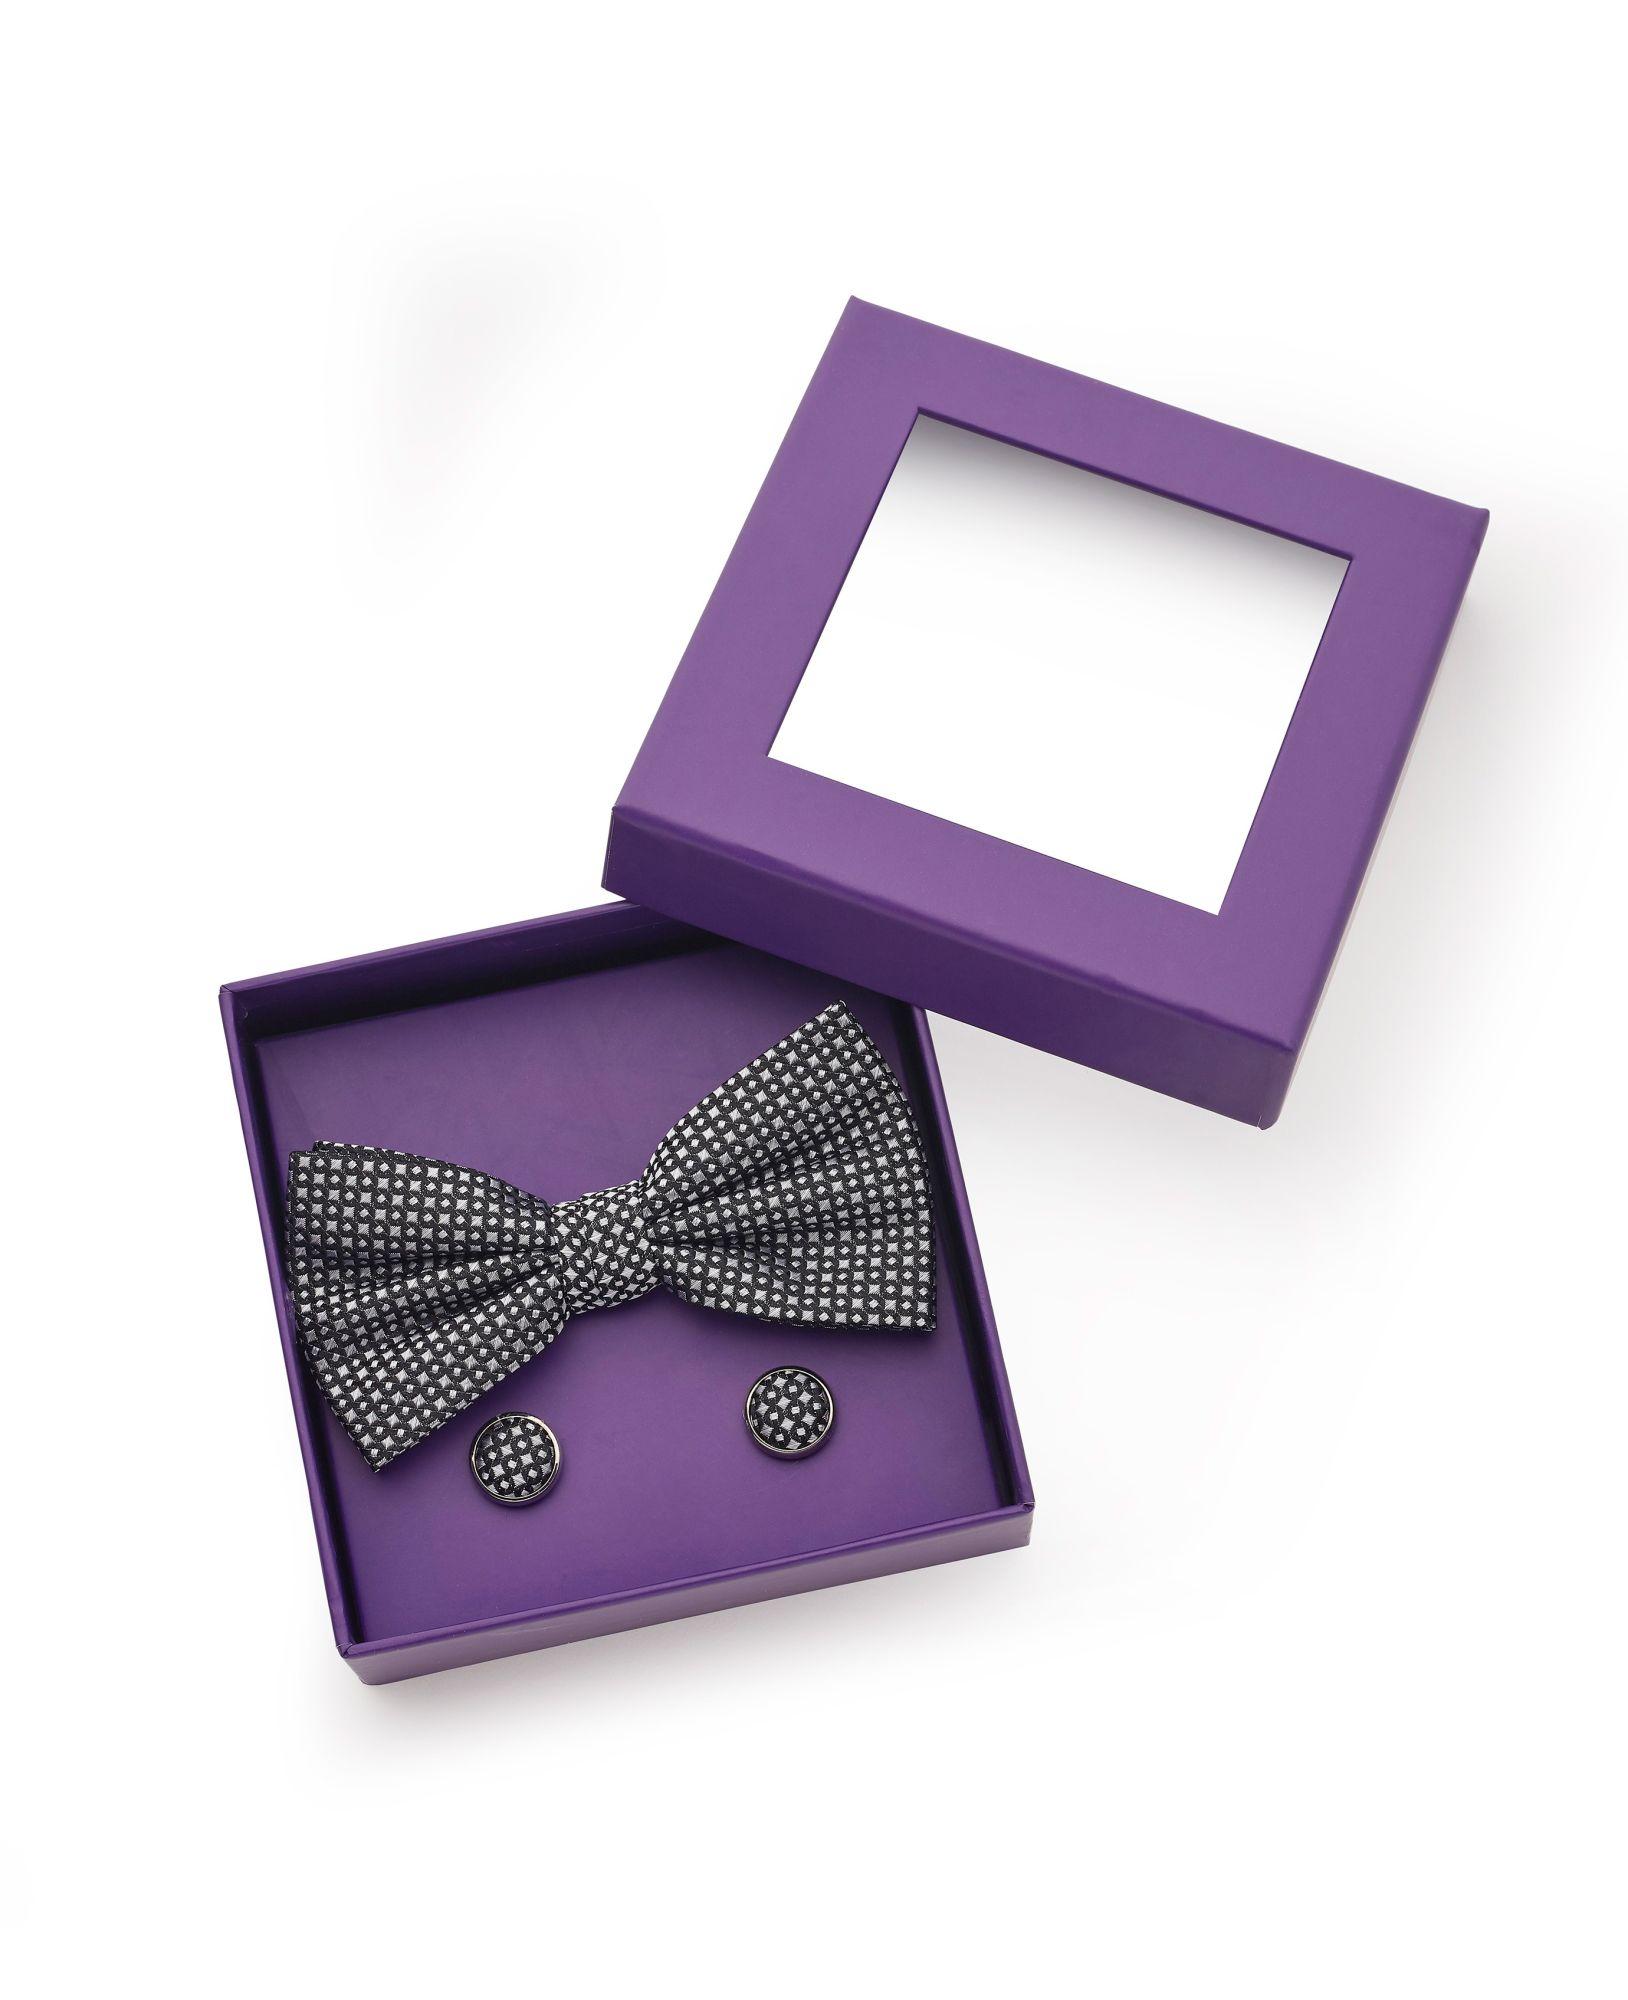 Navy Patterned Silk Bow Tie & Cufflink Set